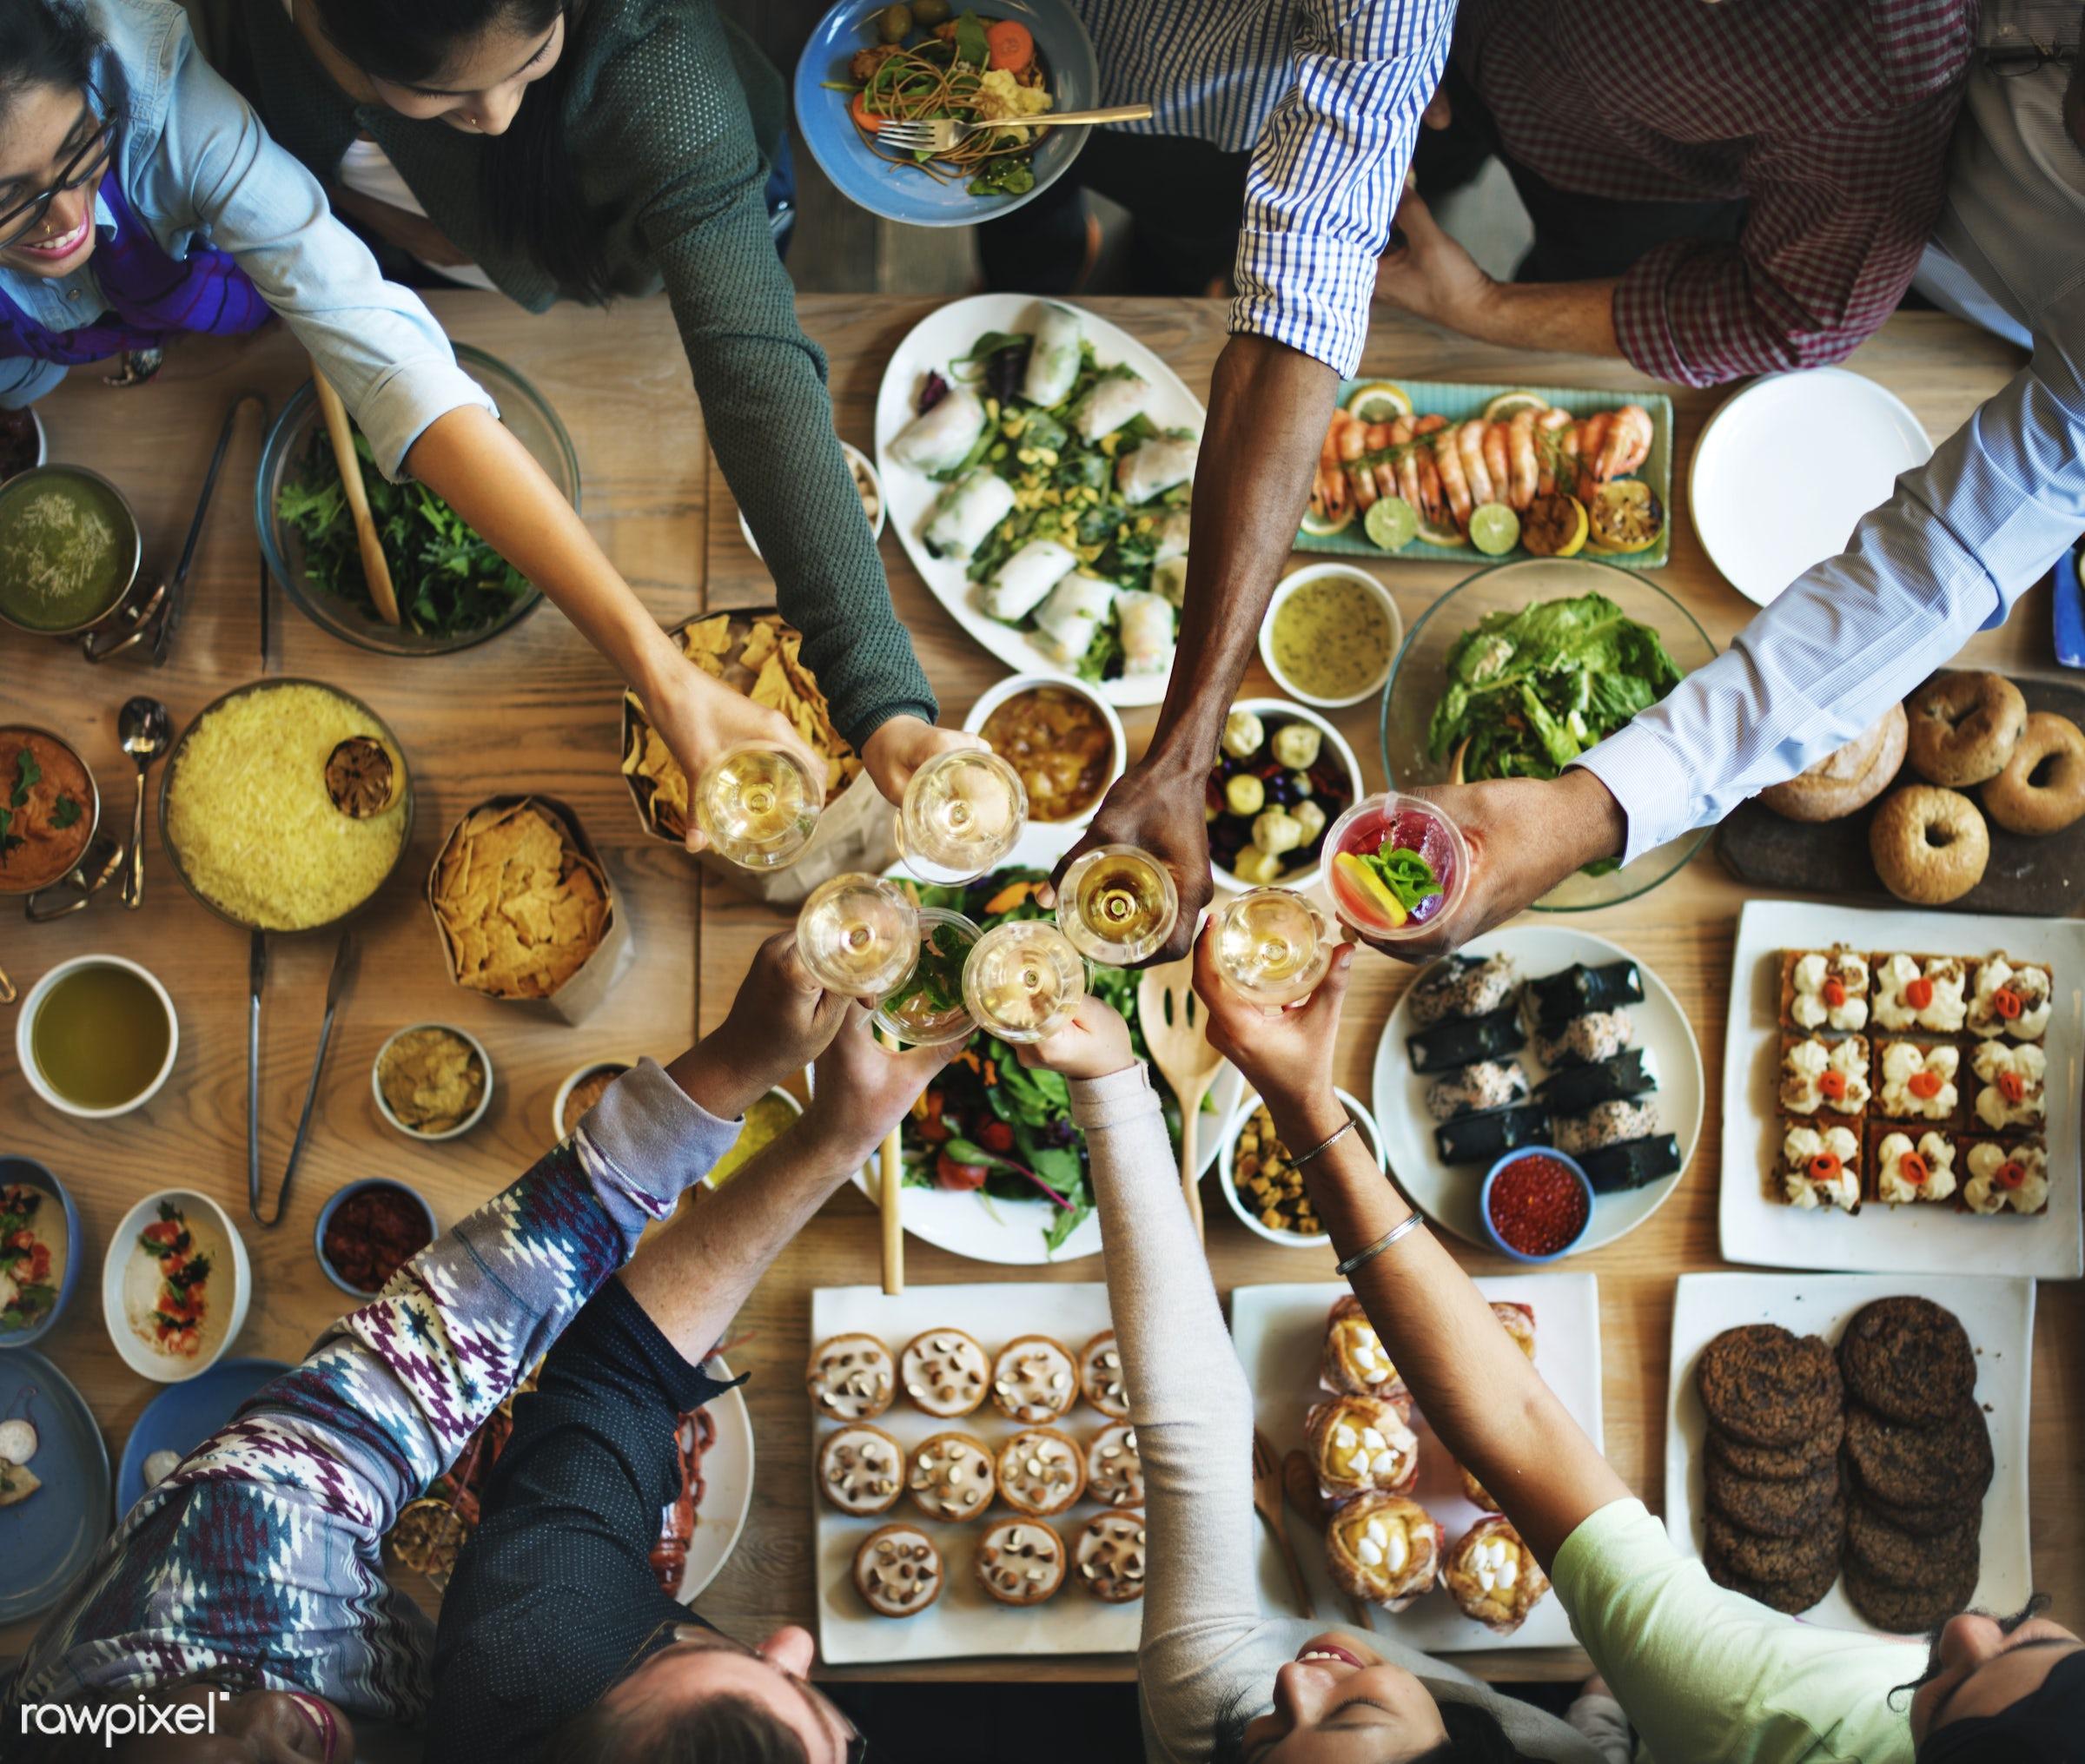 asian food, brunch, buffet, cafe, celebration, cheering, cheers, choice, crowd, dessert, diet, dining, dinner, diversity,...